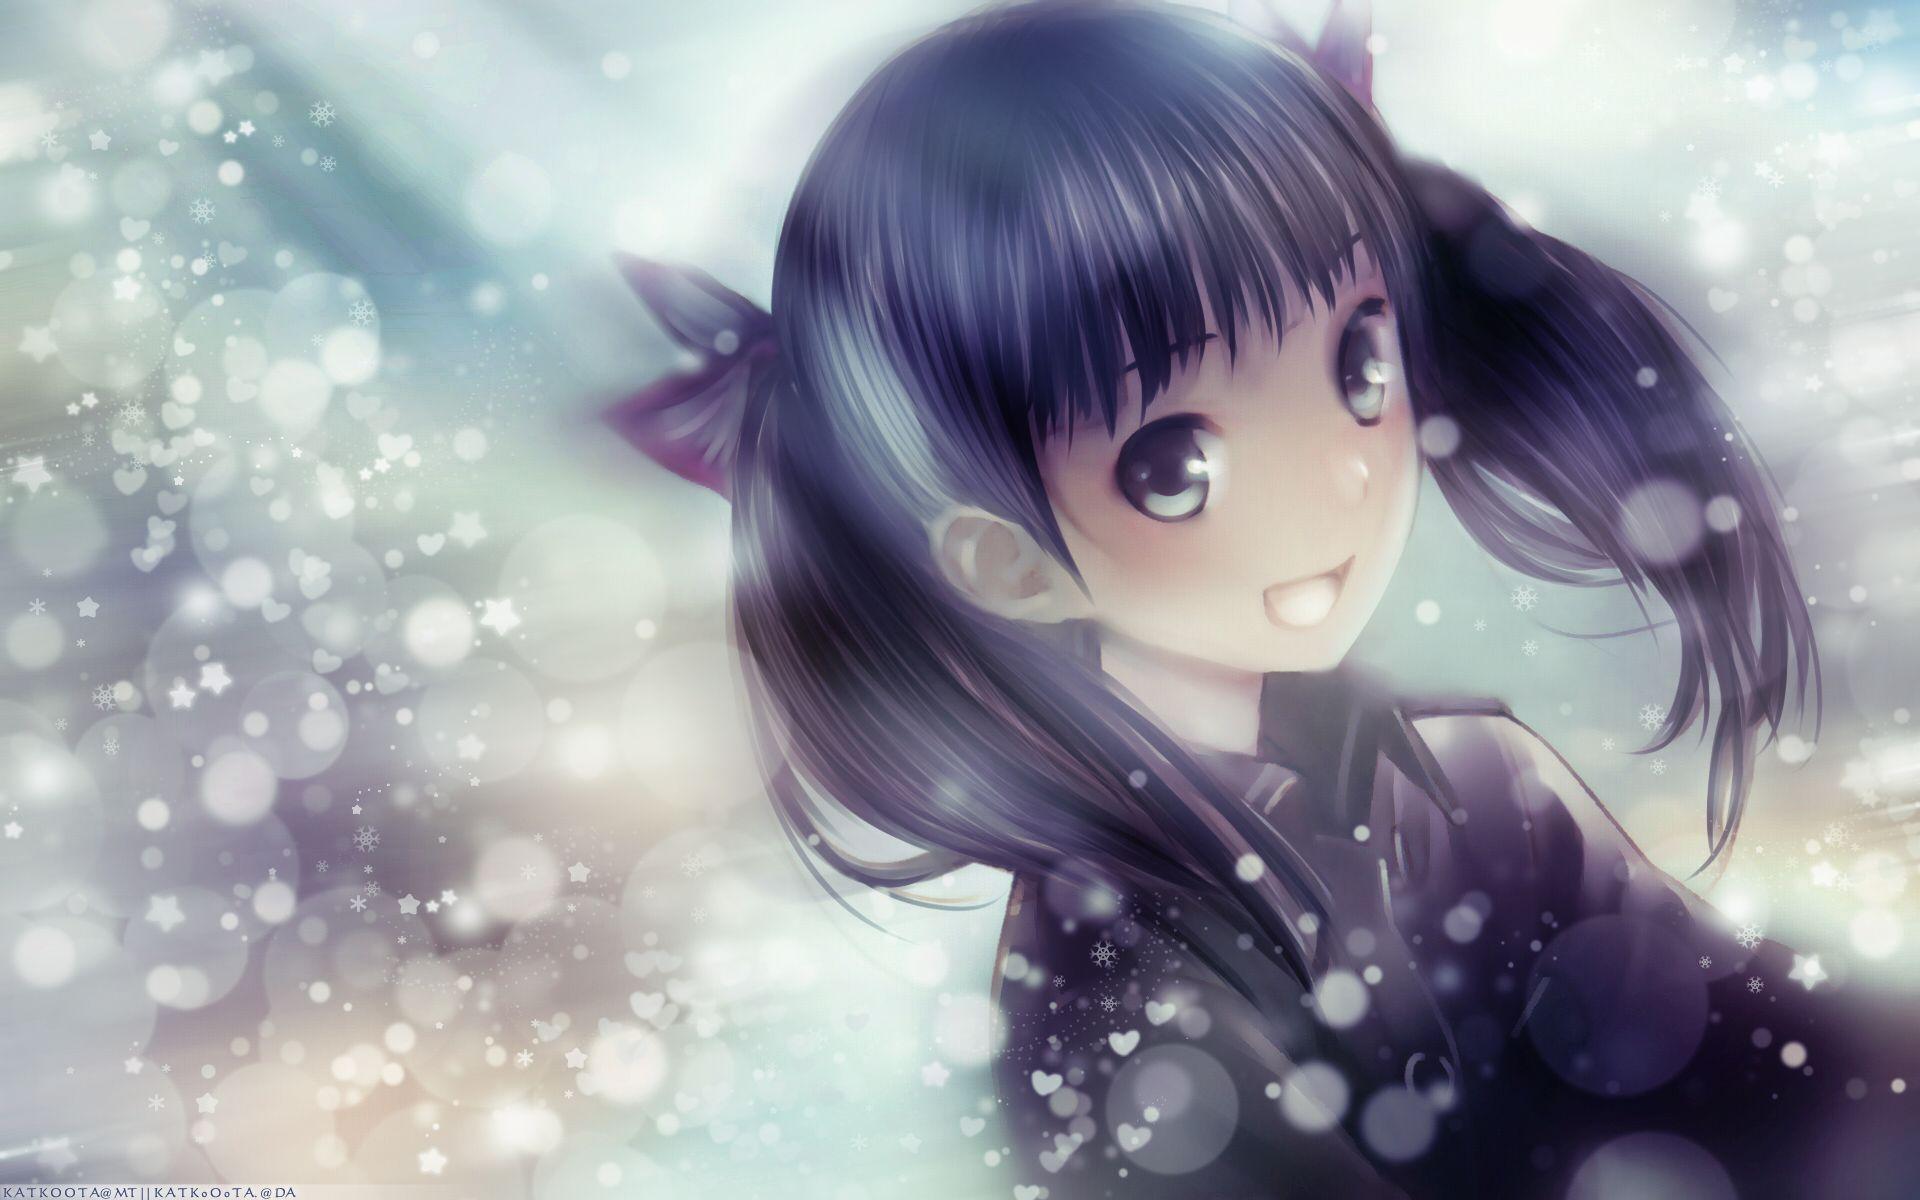 Anime Cute Girl HD Widescreen Desktop Wallpaper yay